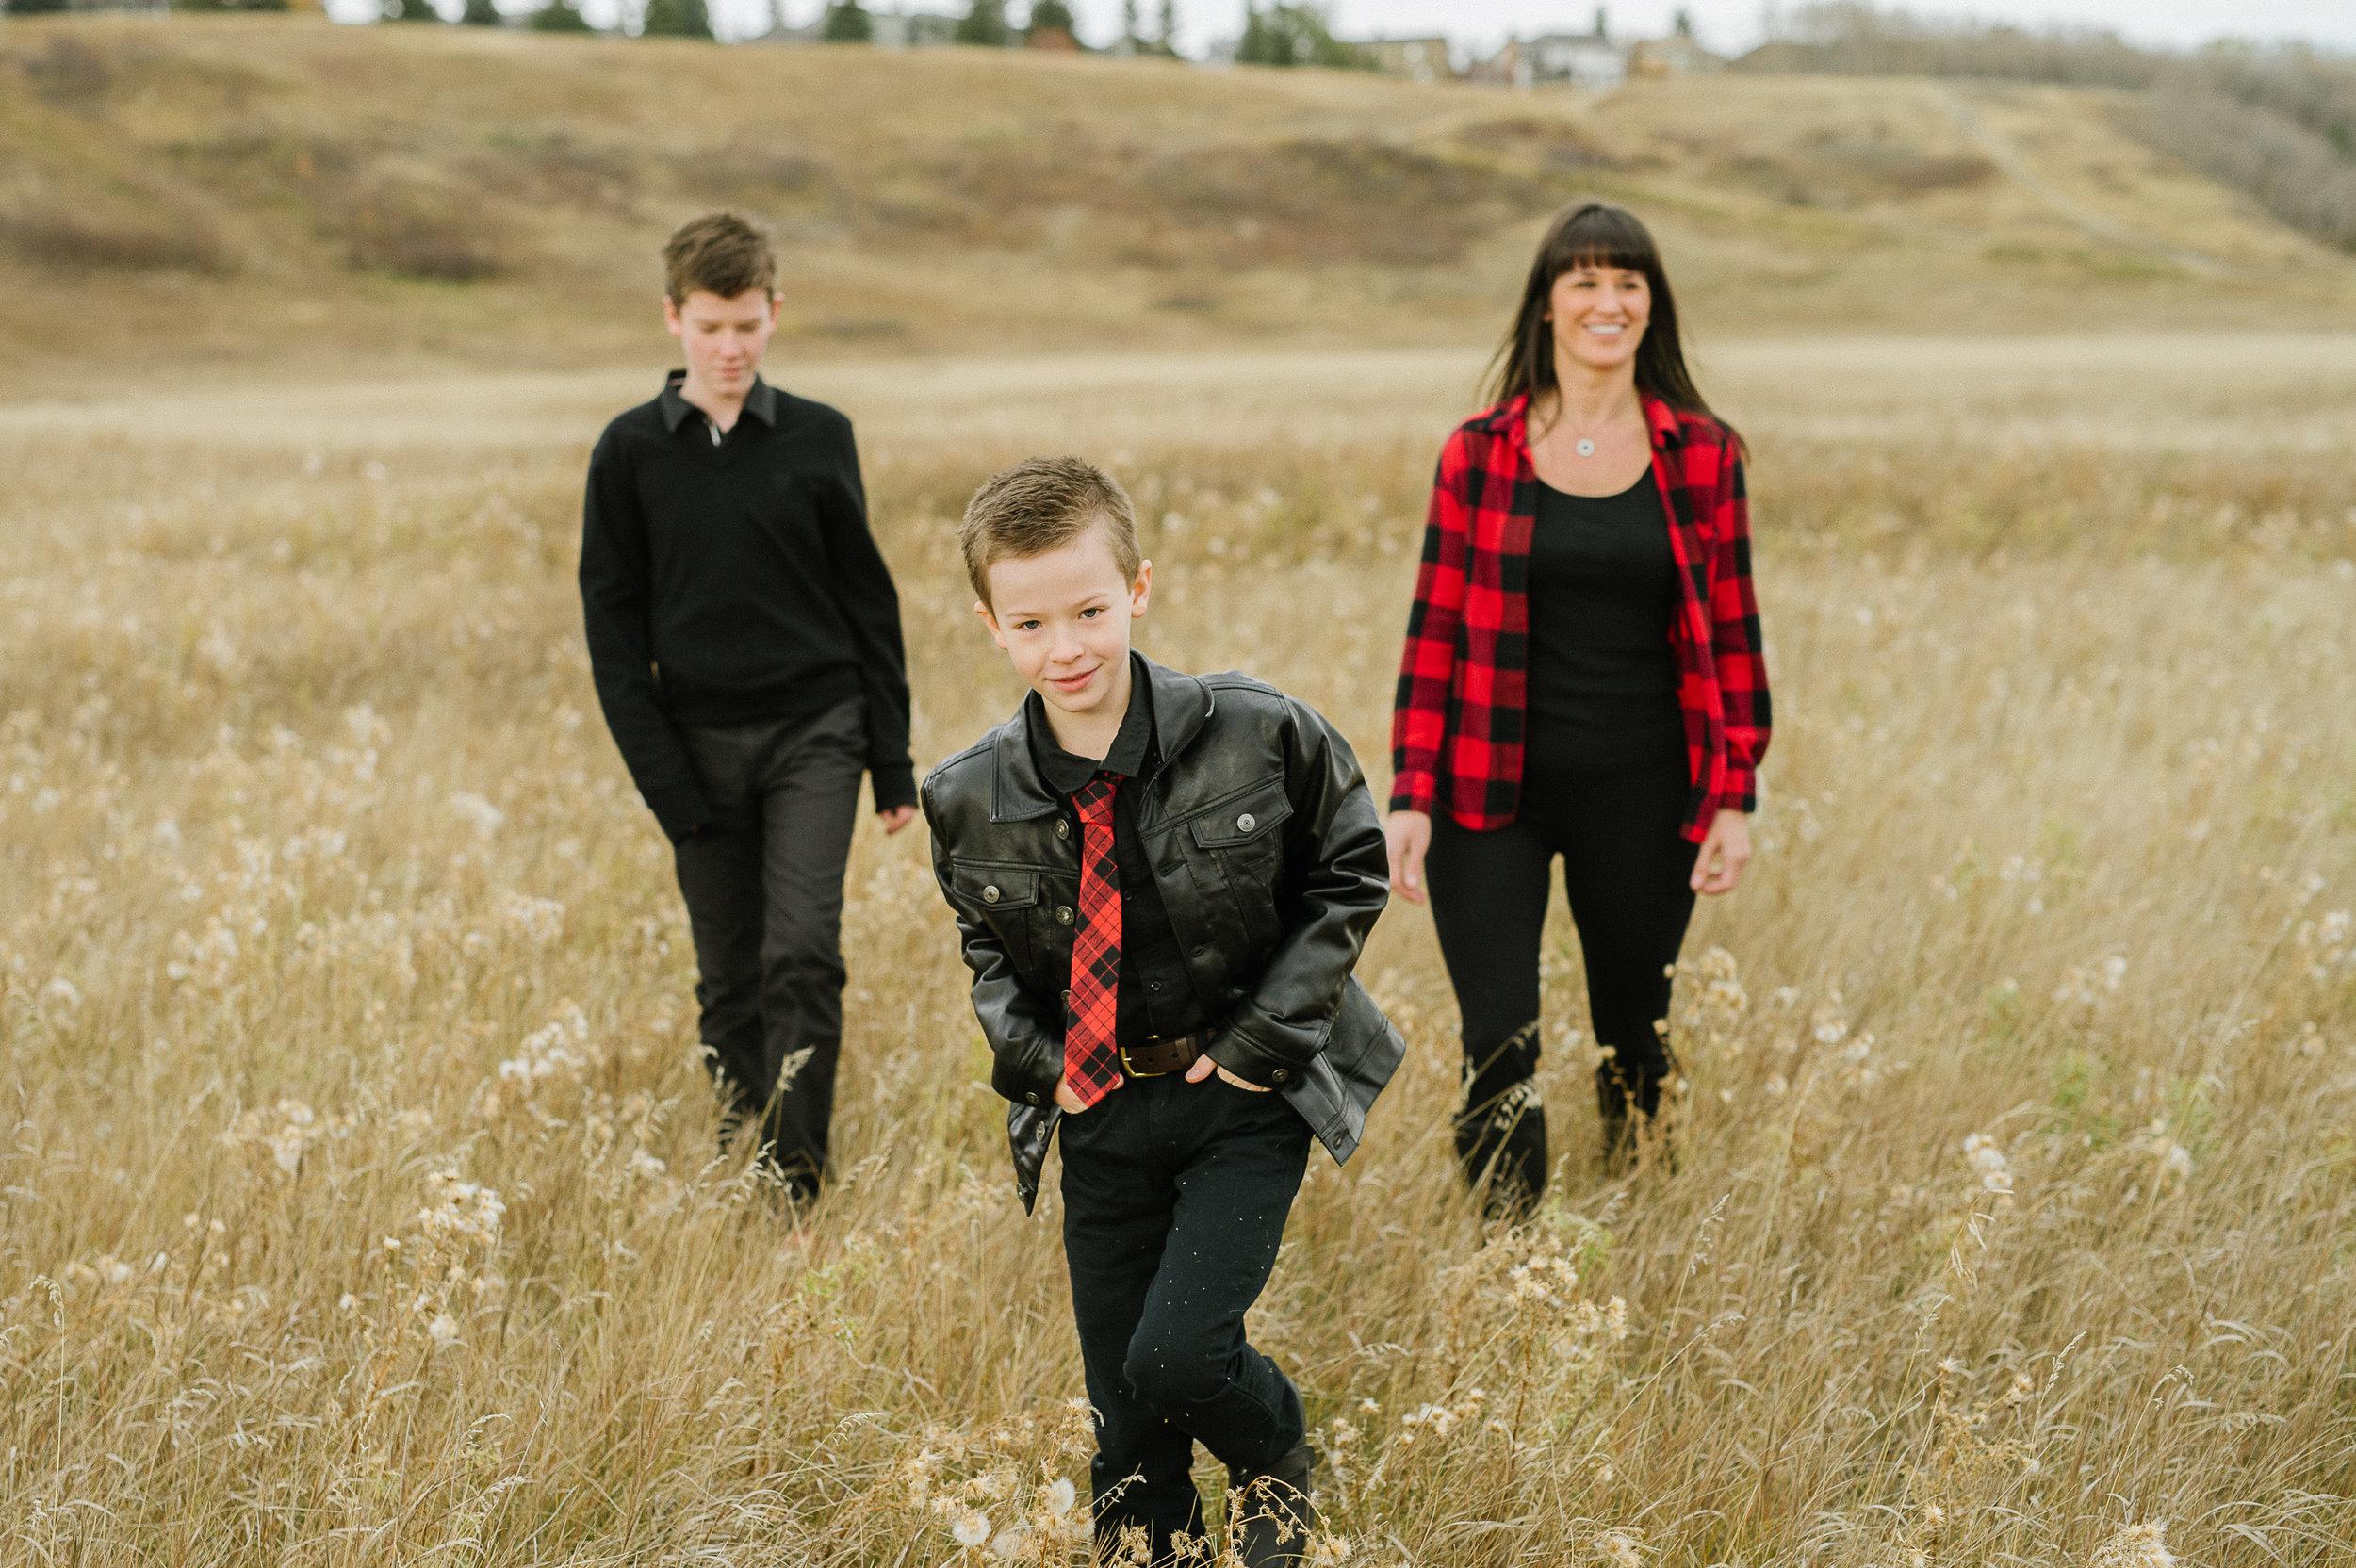 Calgary_Family_Photography_Peters_2017_HR 0030.jpg